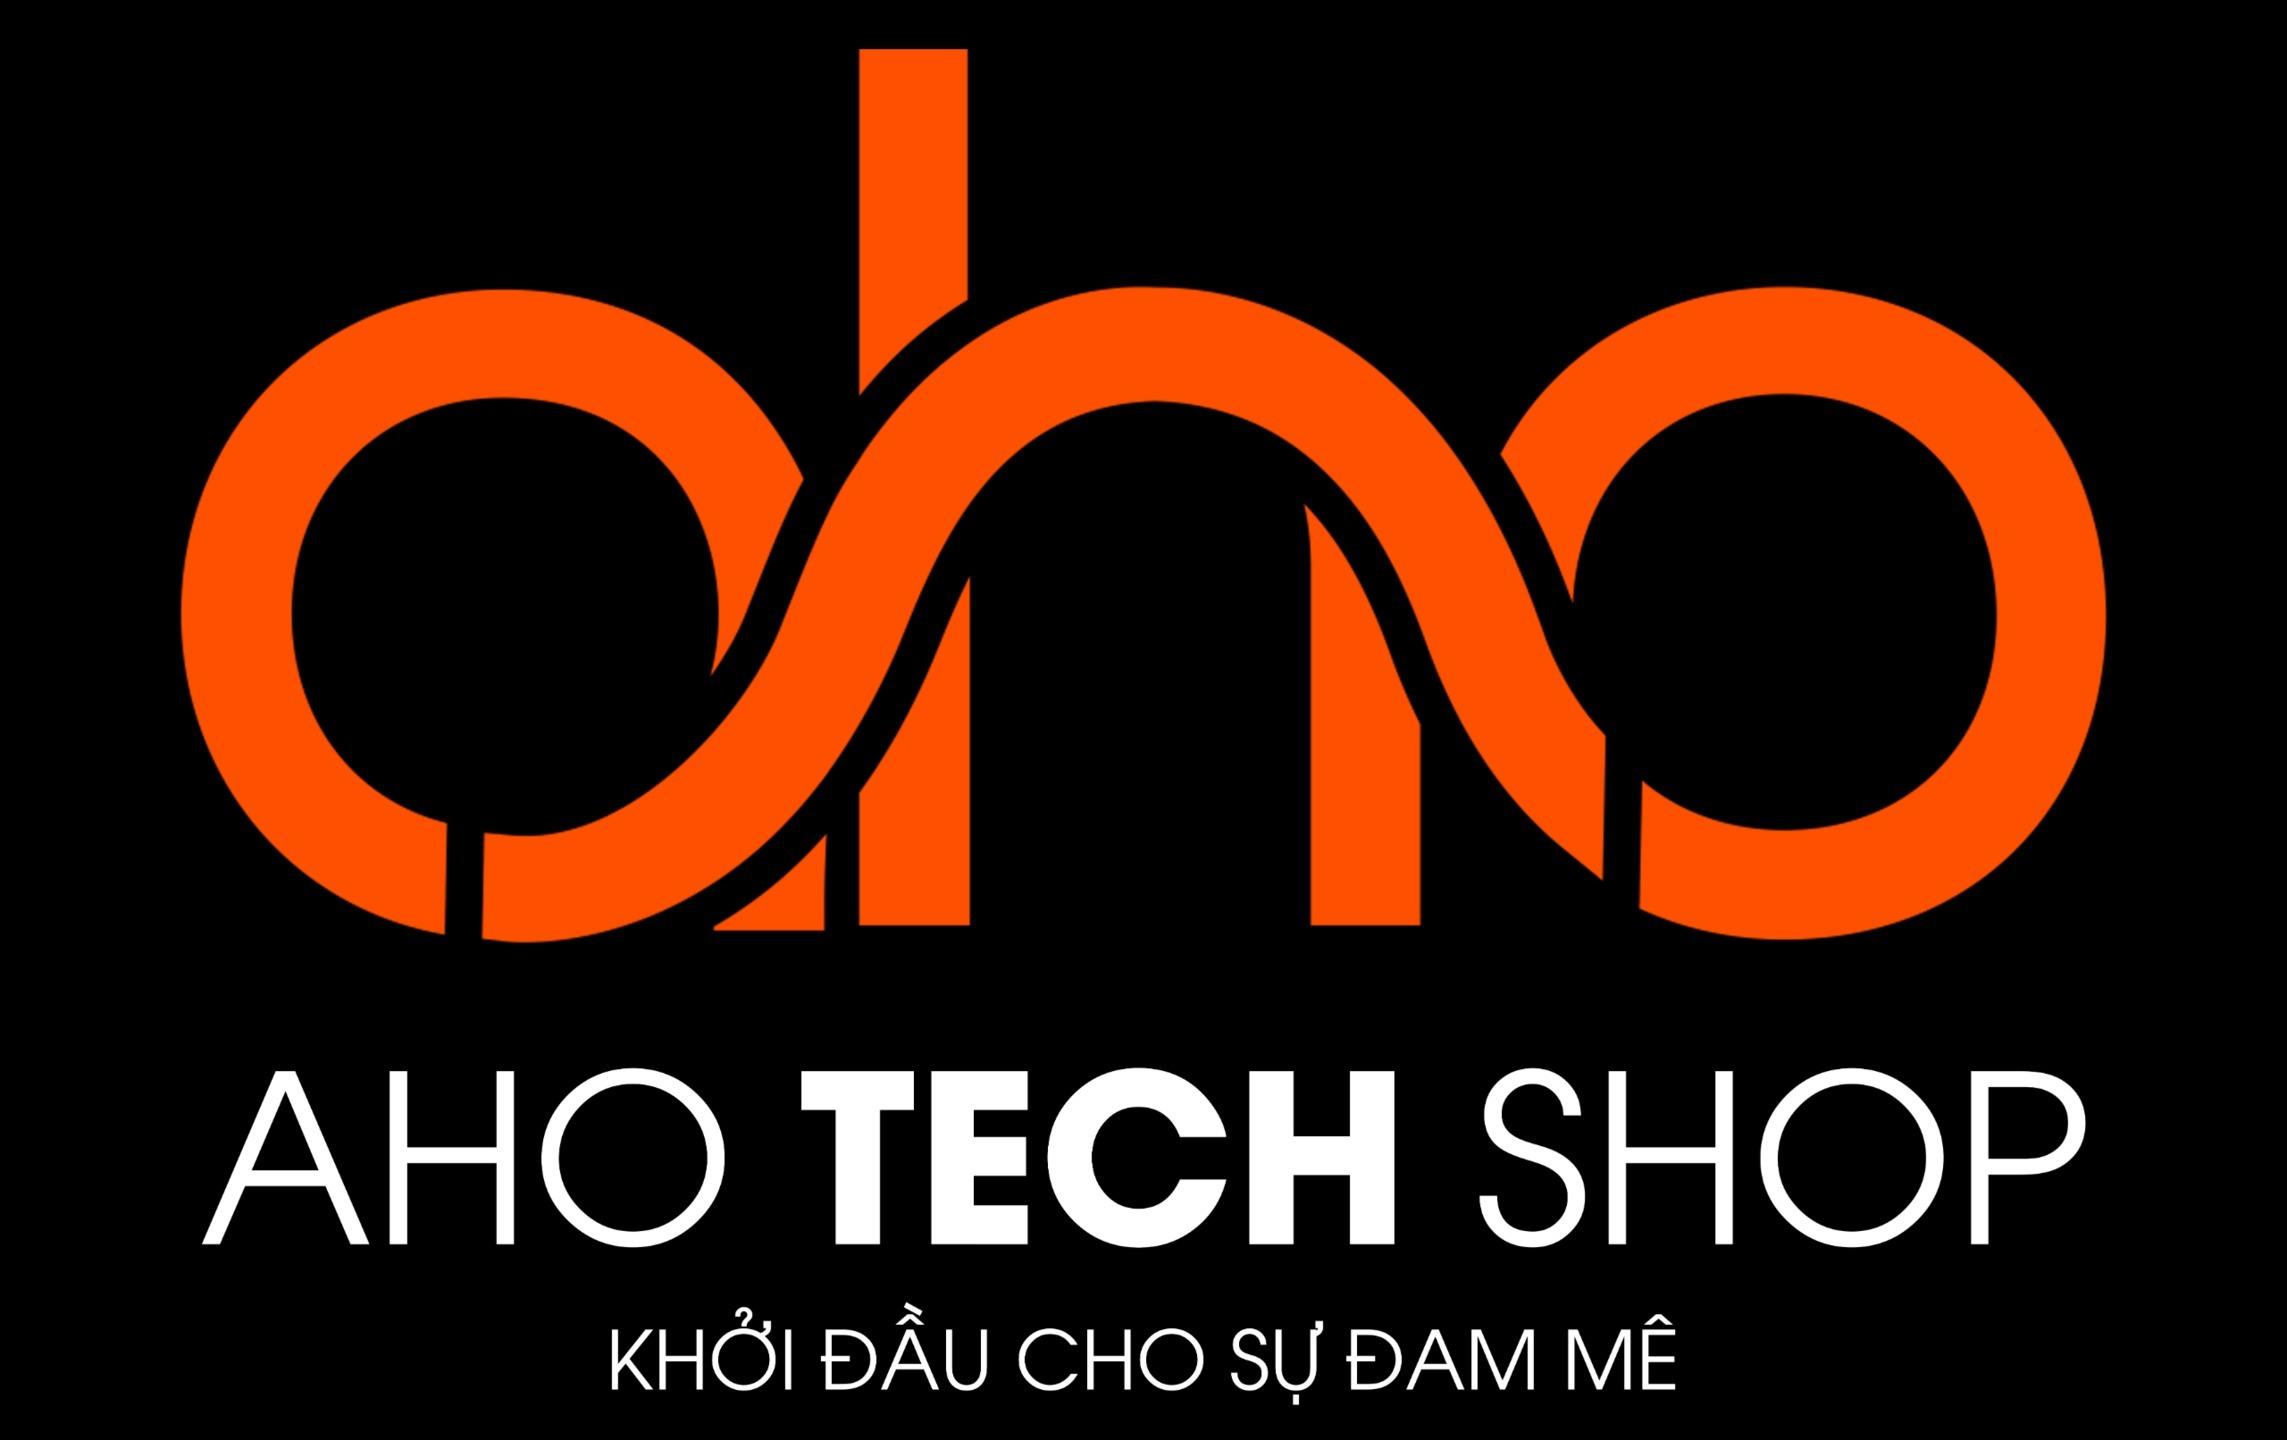 Aho Tech Sh (@ahotechshop) Cover Image